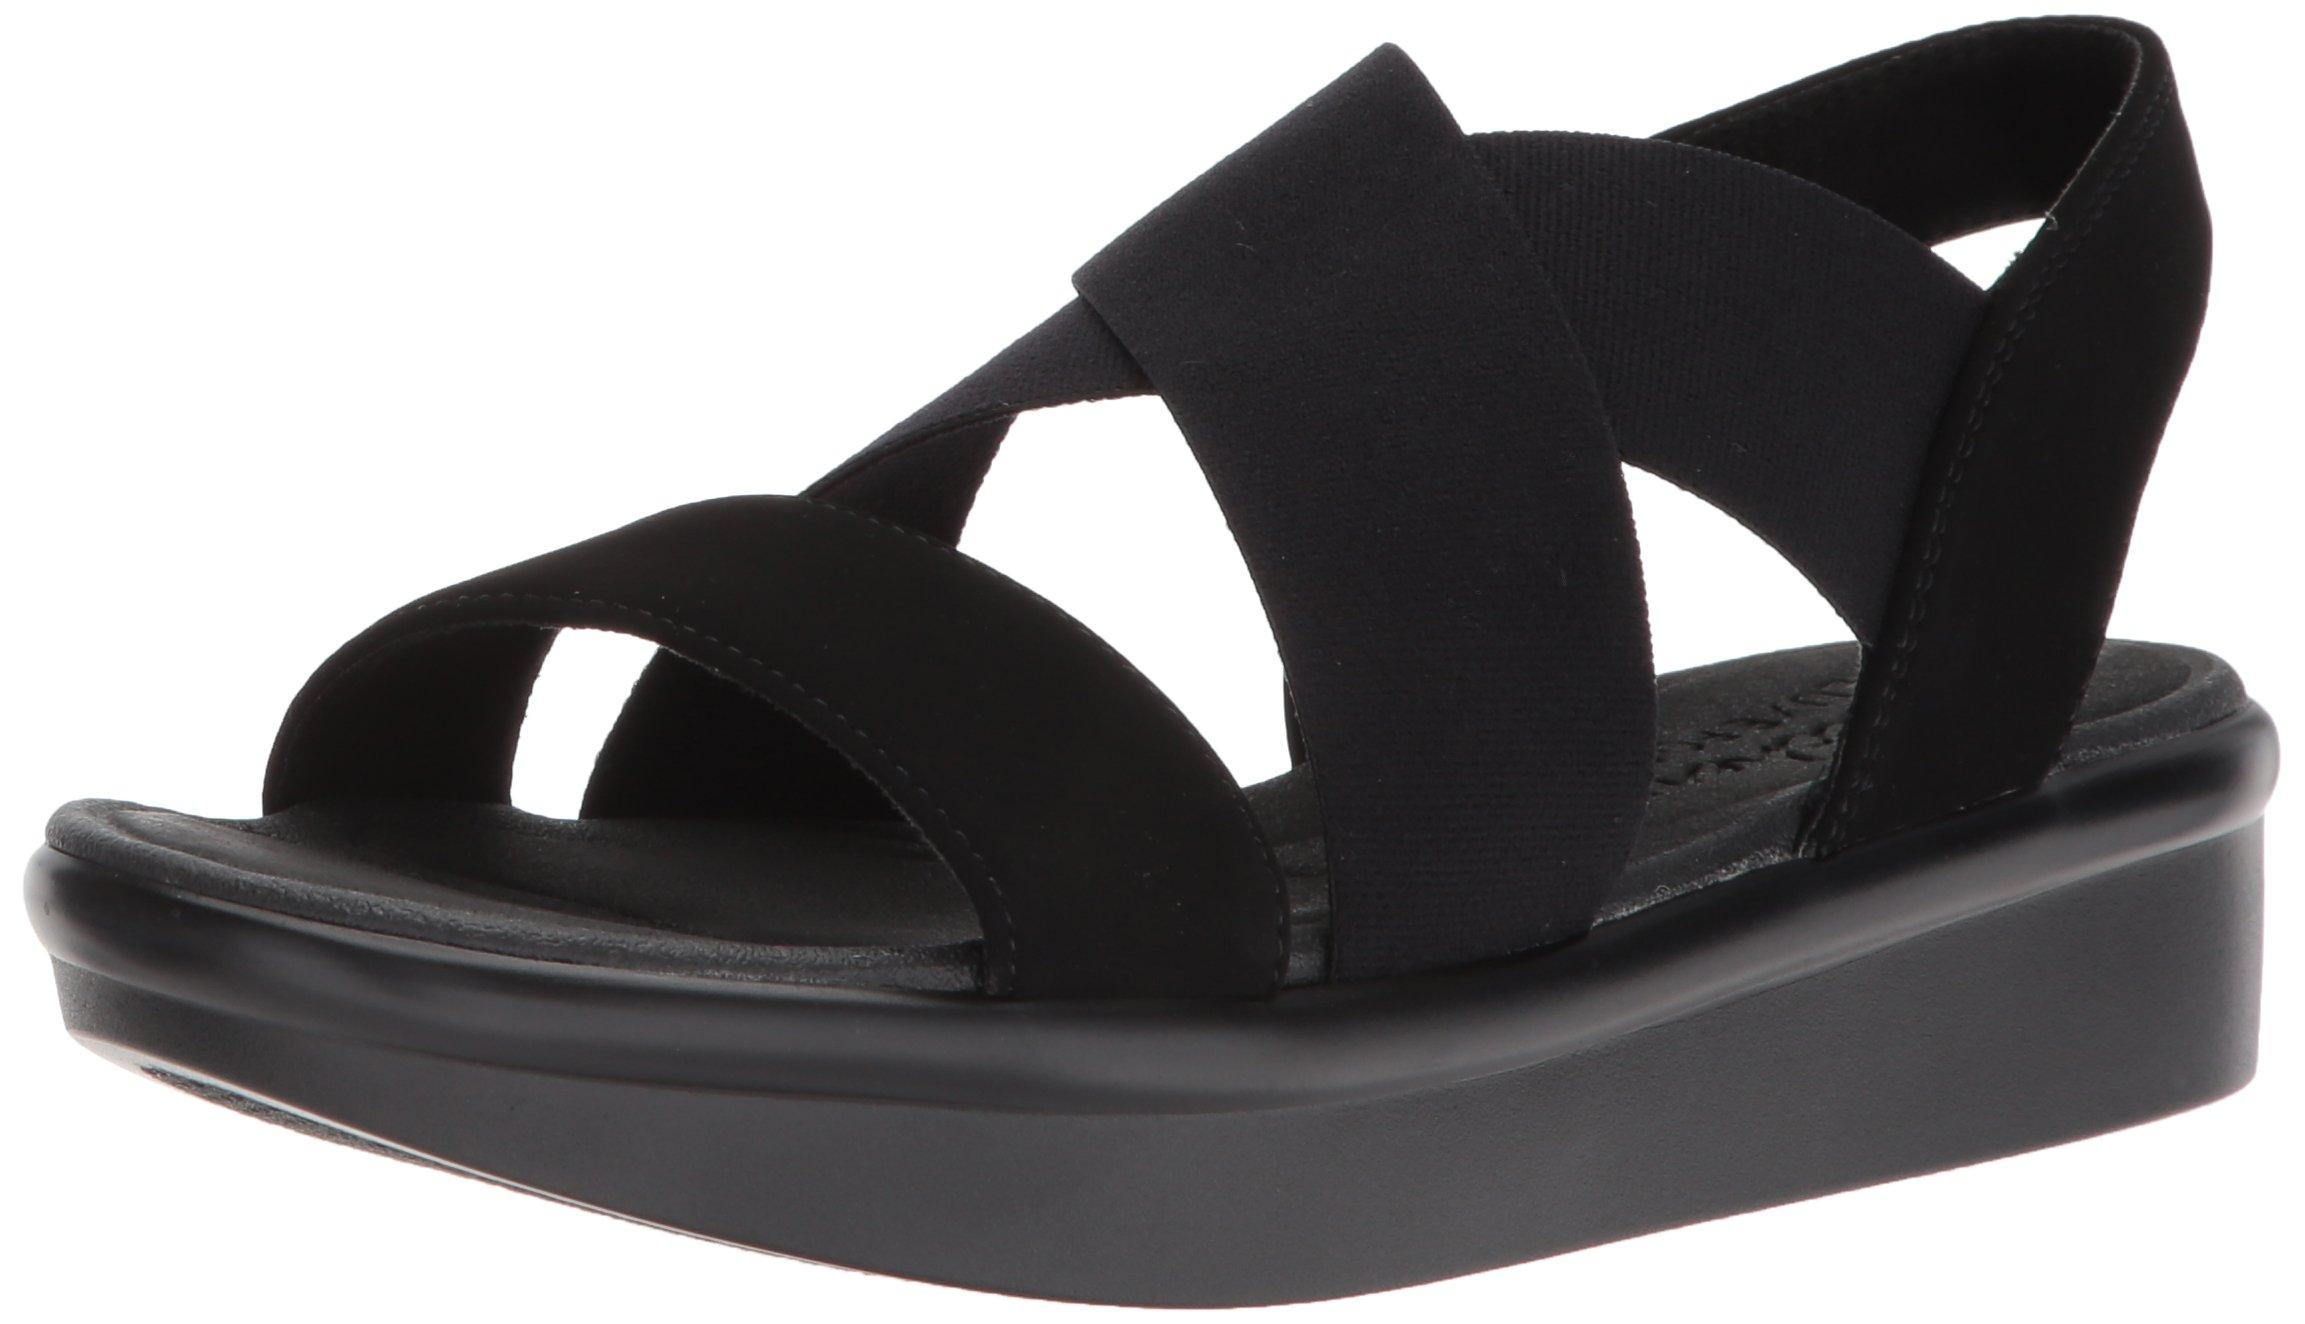 Skechers Cali Women's Bumblers-Super Style Sandal,Black/Black,10 M US